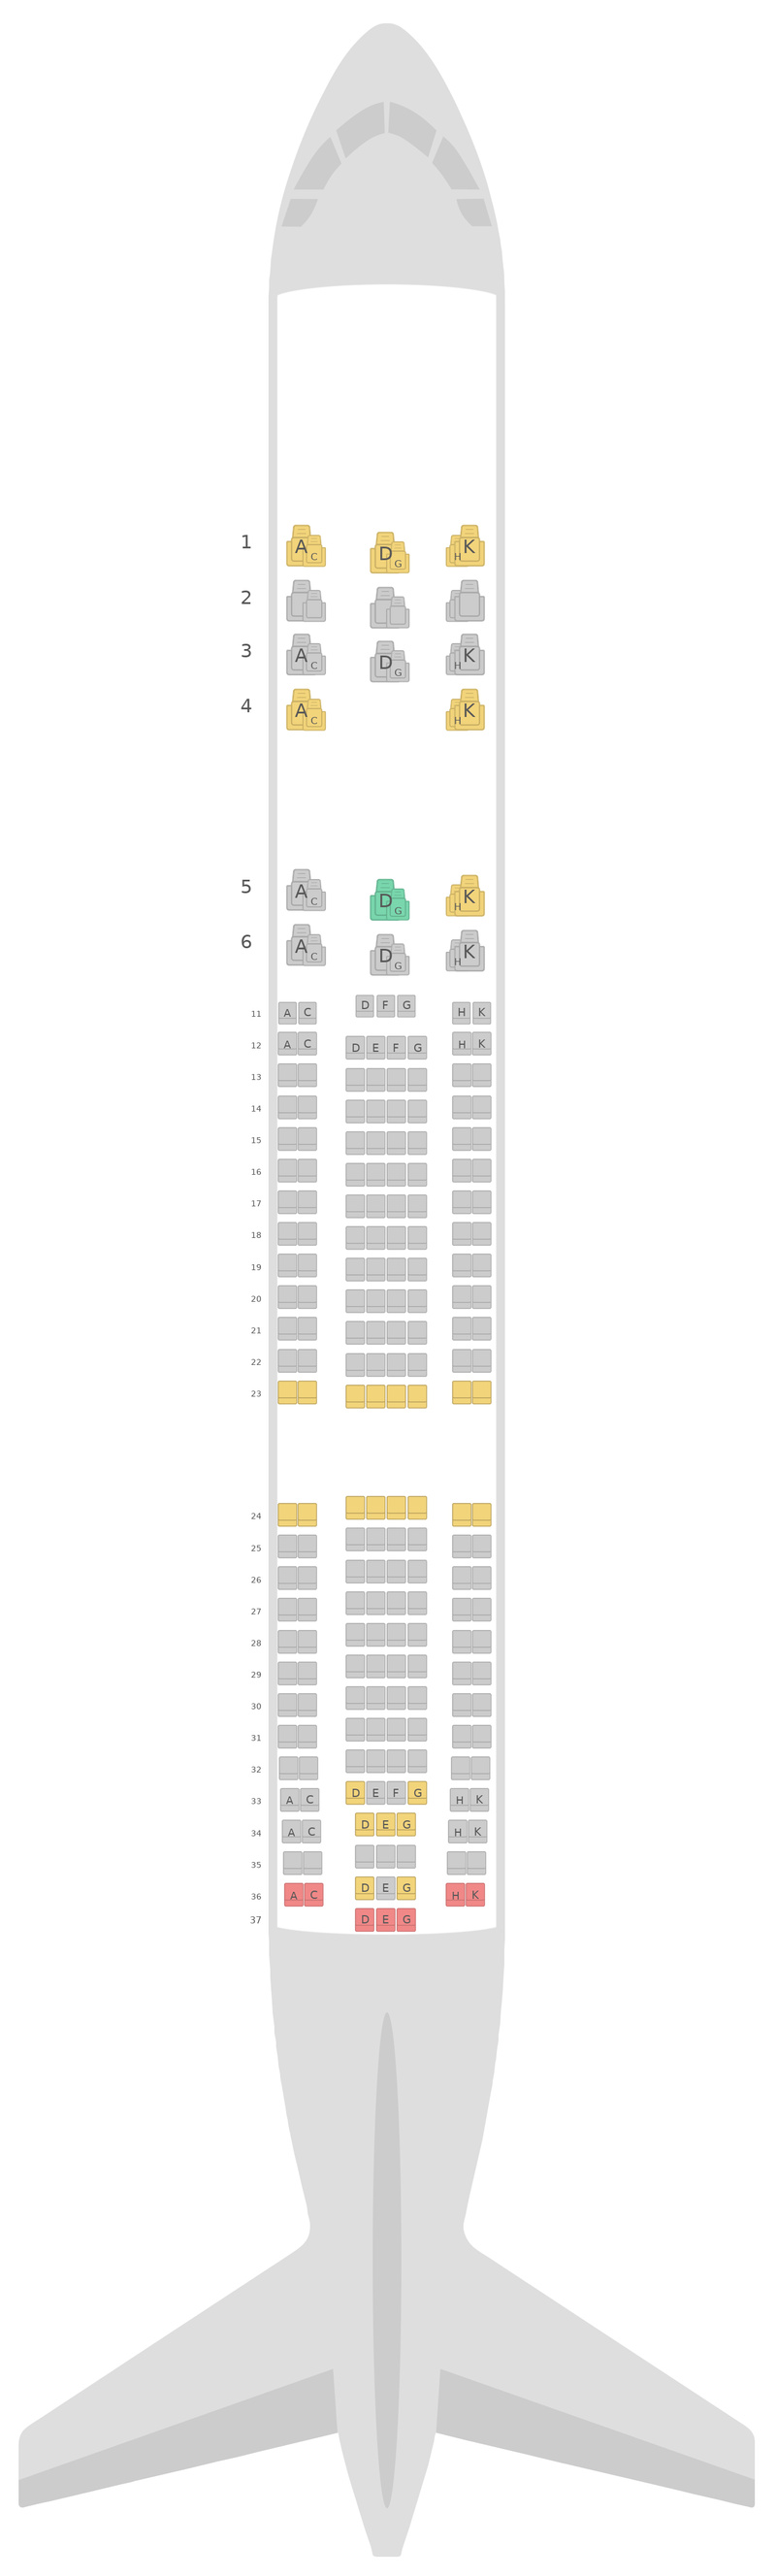 Схема салона Аэробус А330-200 (332) v1  Аэрофлот